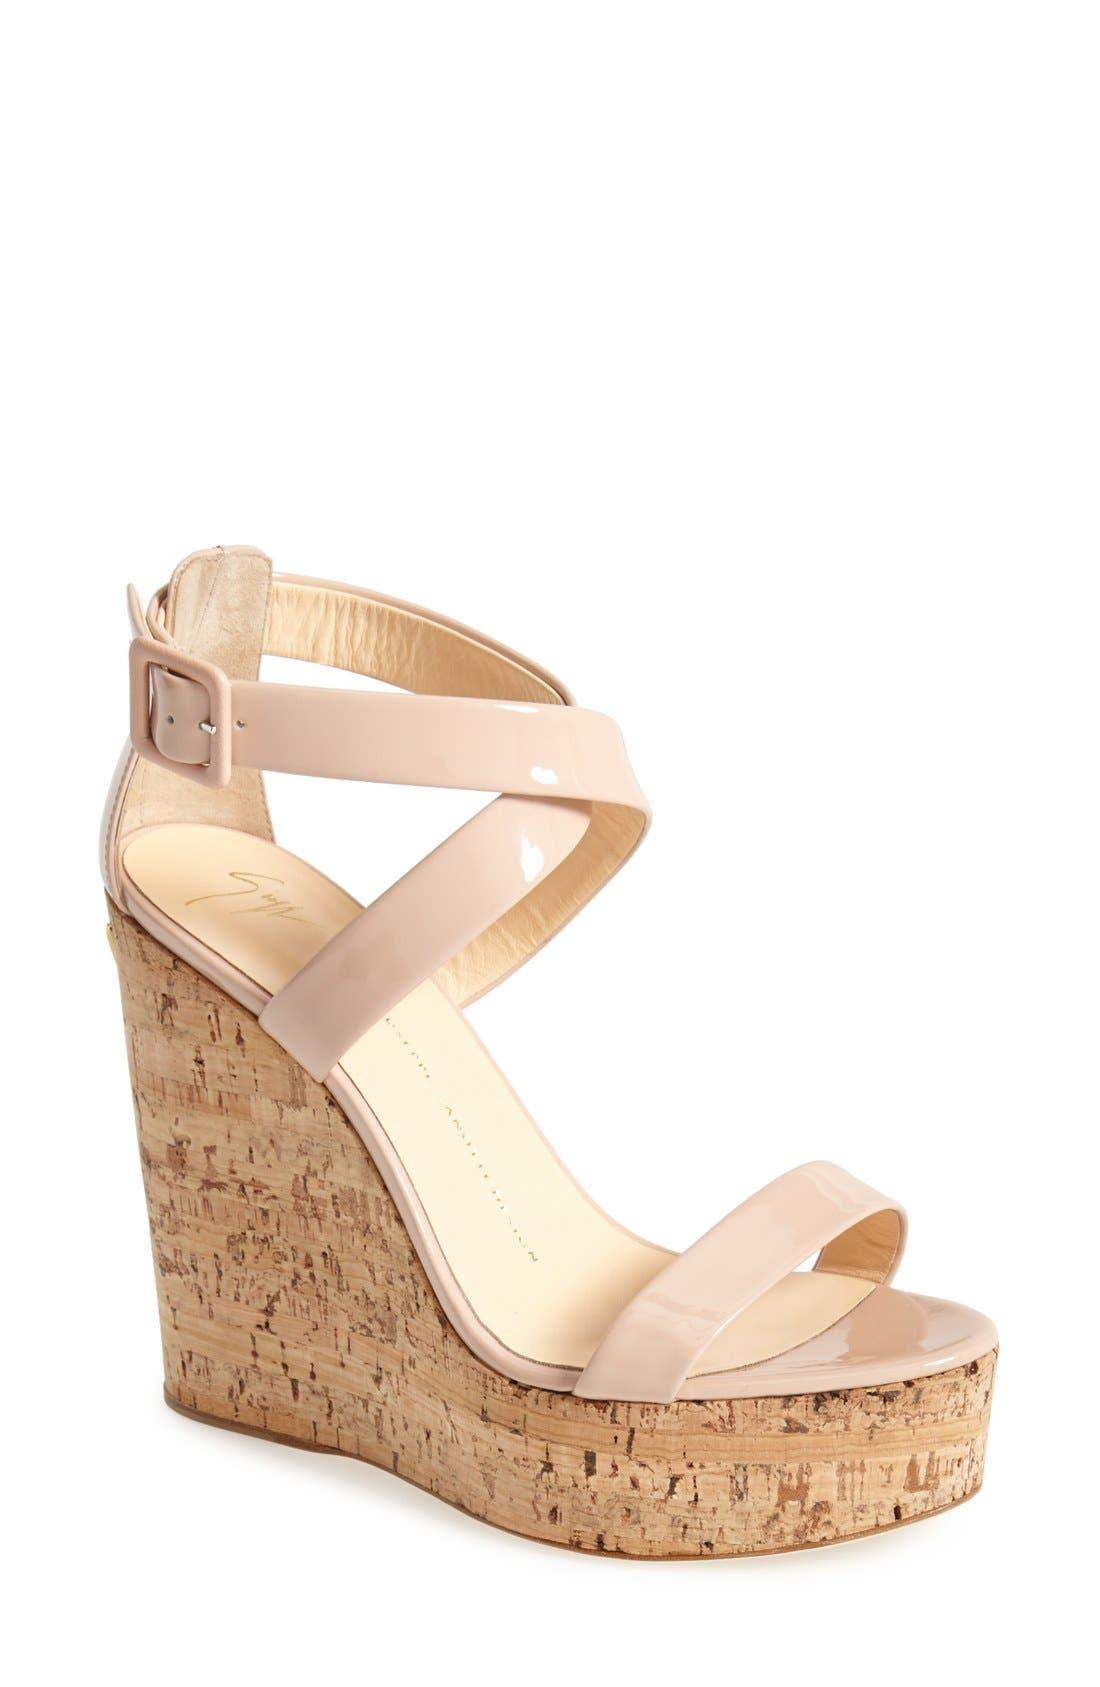 Main Image - Giuseppe Zanotti 'Roz' Platform Wedge Sandal (Women)